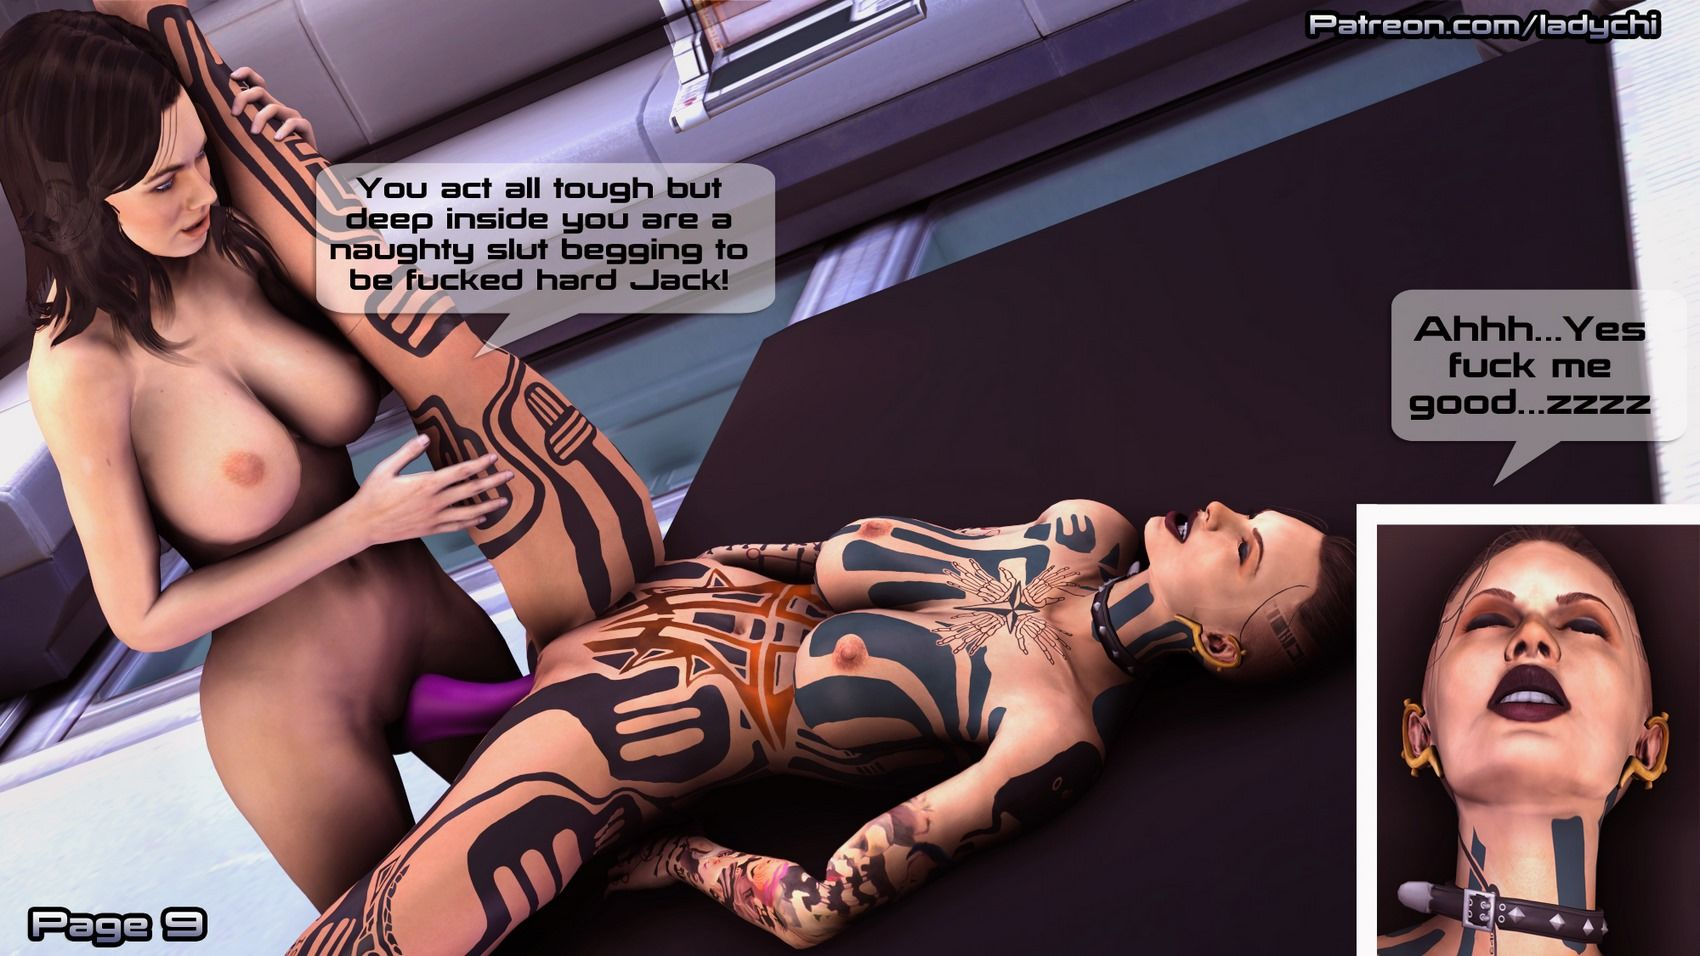 Jacks_Dream_Ladychi_(Mass_Effect) comix_57842.jpg